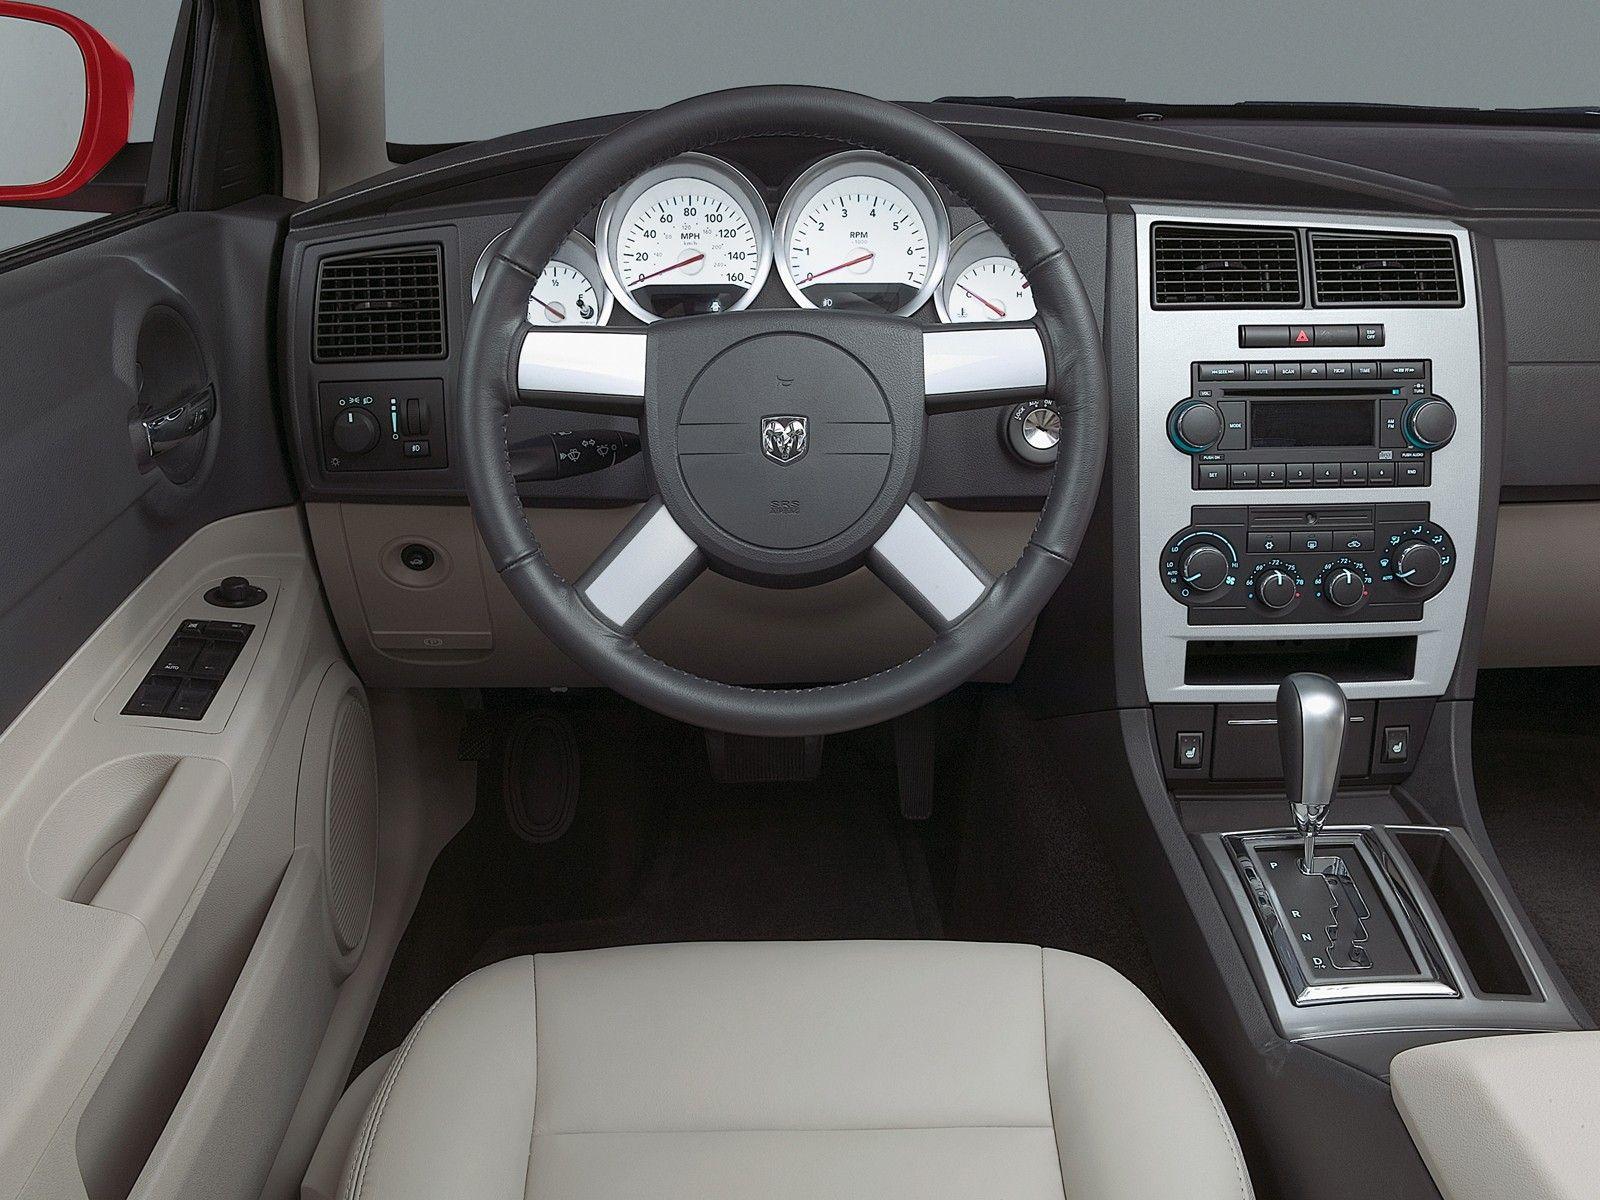 2006 Dodge Charger interior gauges | Dodge Interiors | Dodge